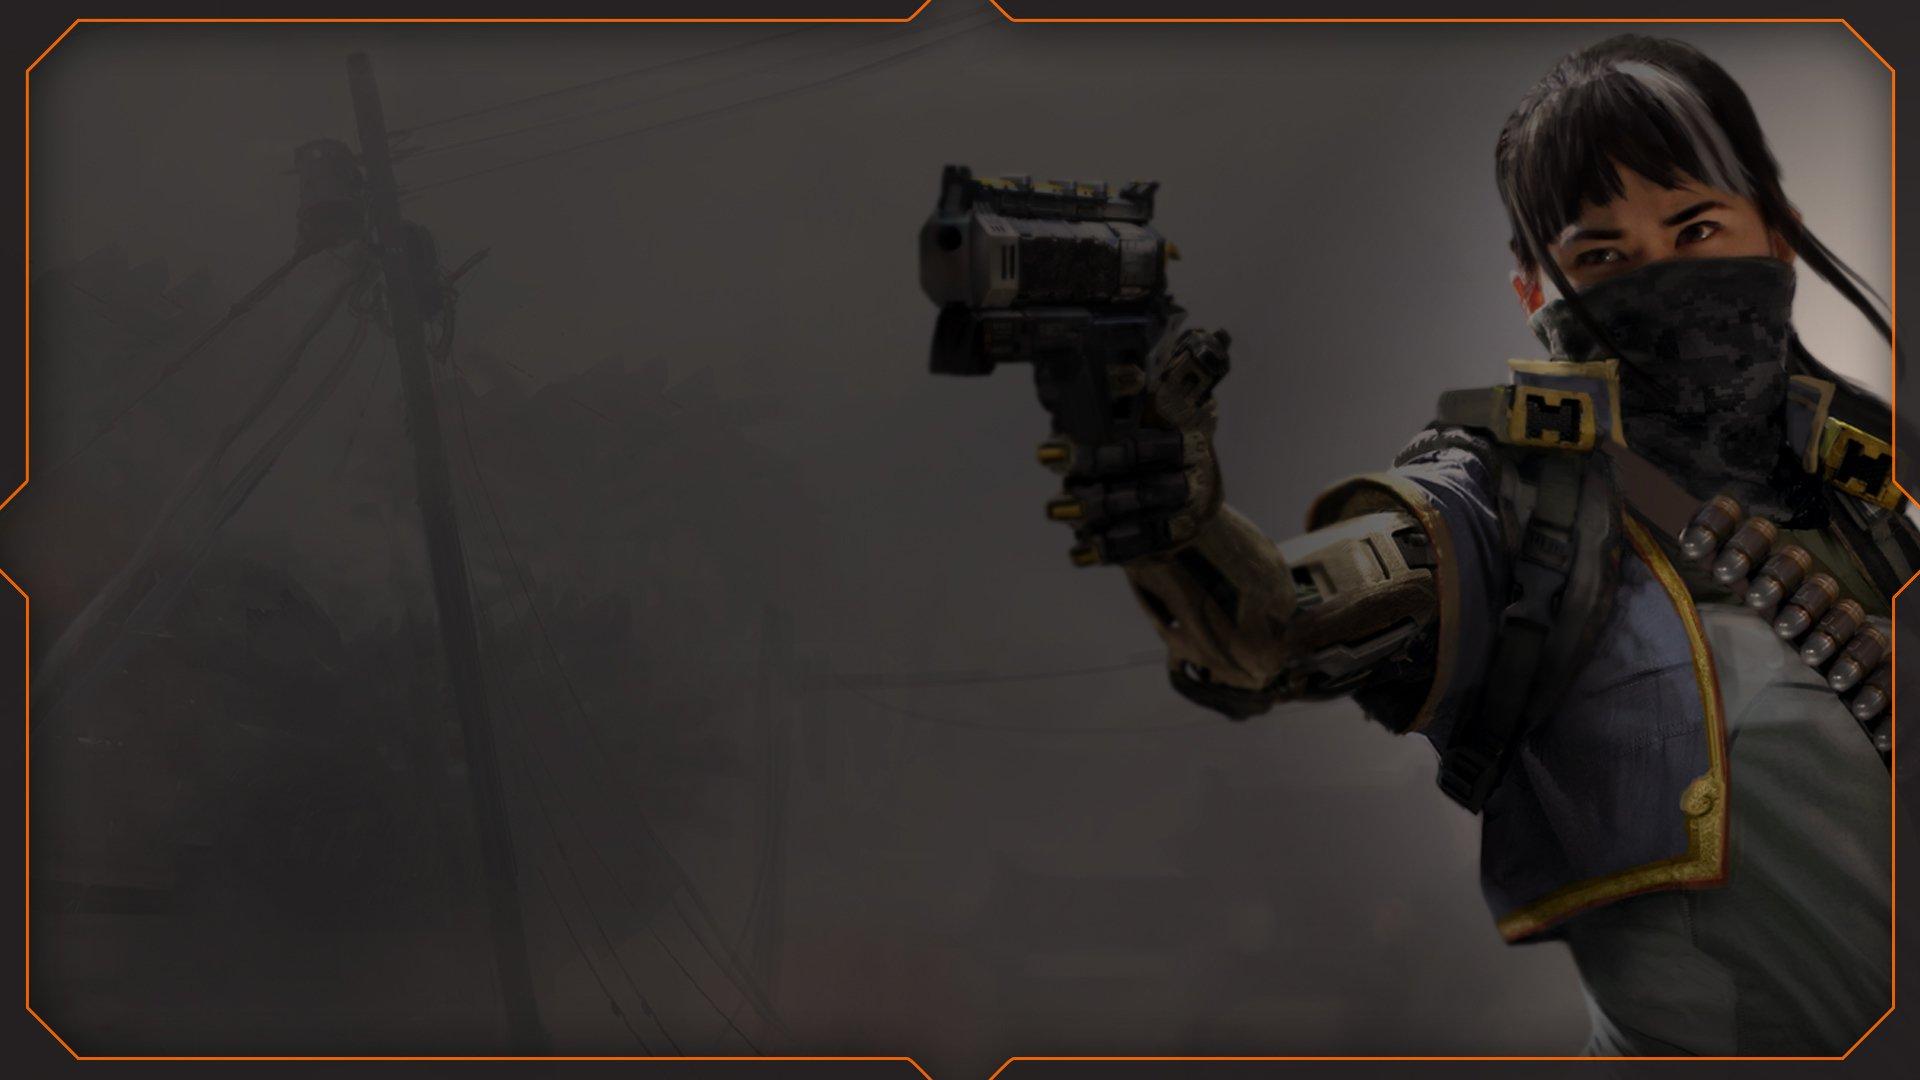 Black Ops 4 Seraph - HD Wallpaper